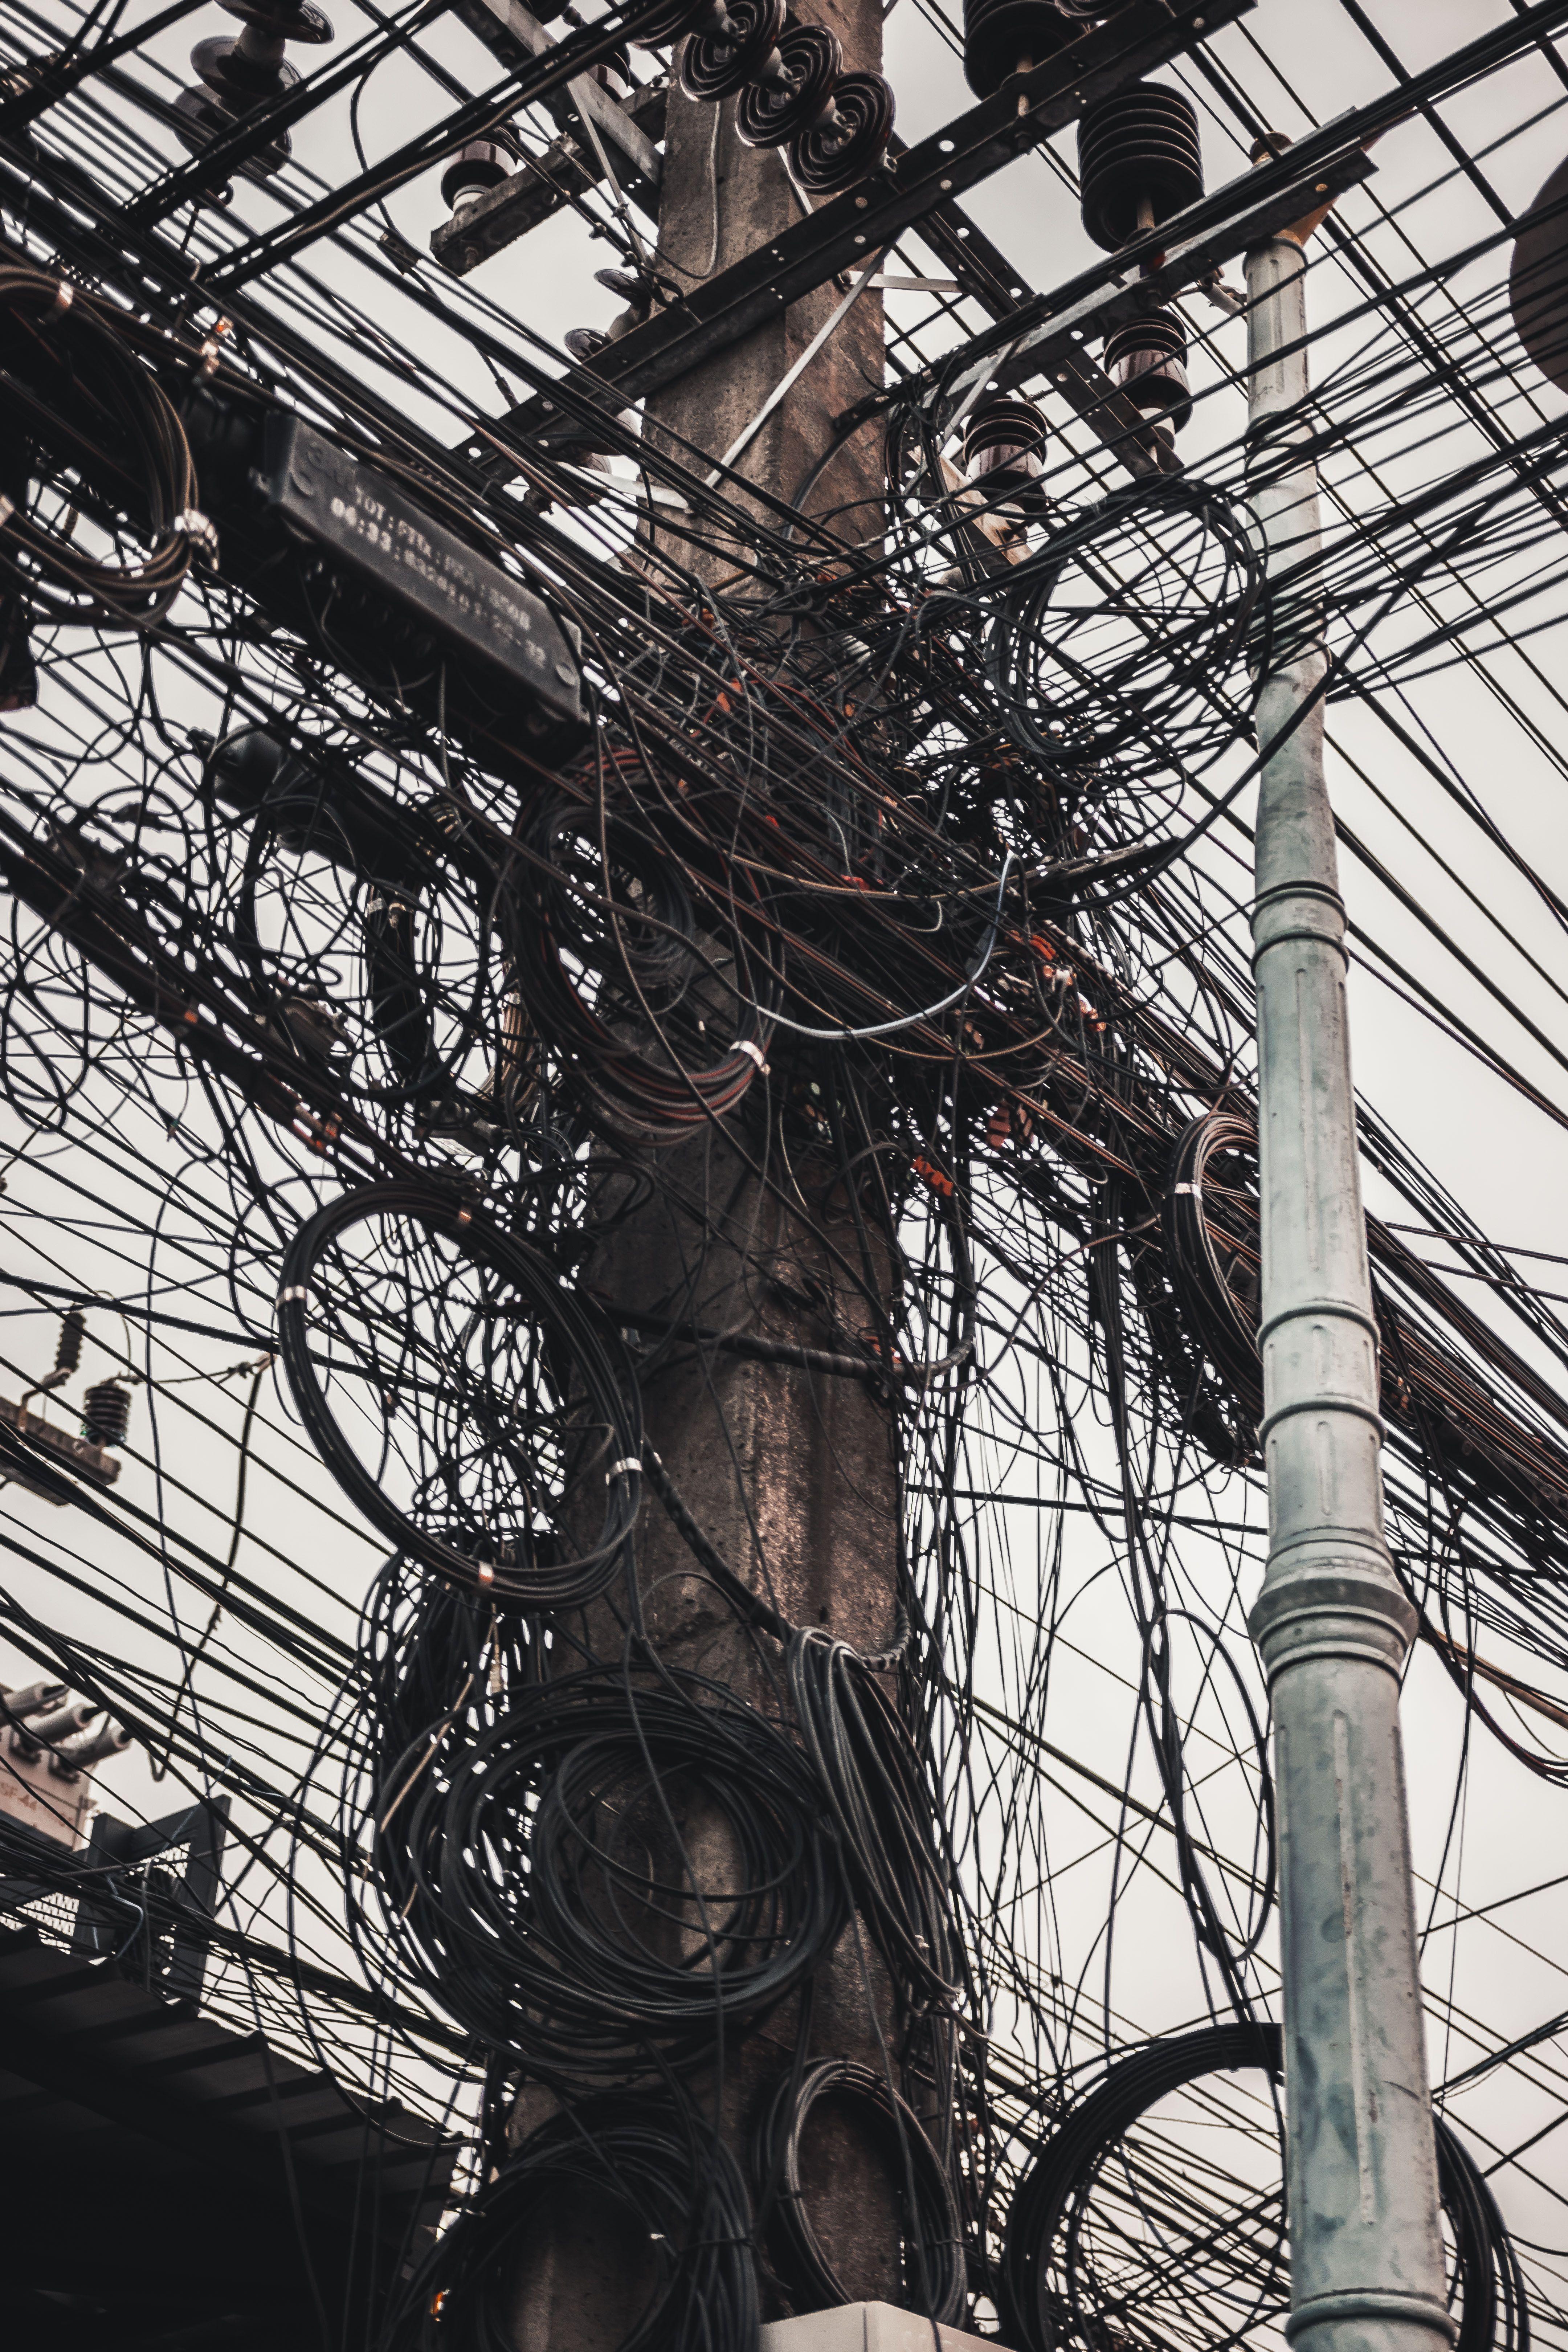 Electrical Spaghetti Messy Electrical Wiring At Phuket Phuketthailand Patongbeach Banglaroad Electri Travel Picture Ideas Walking Street Patong Beach